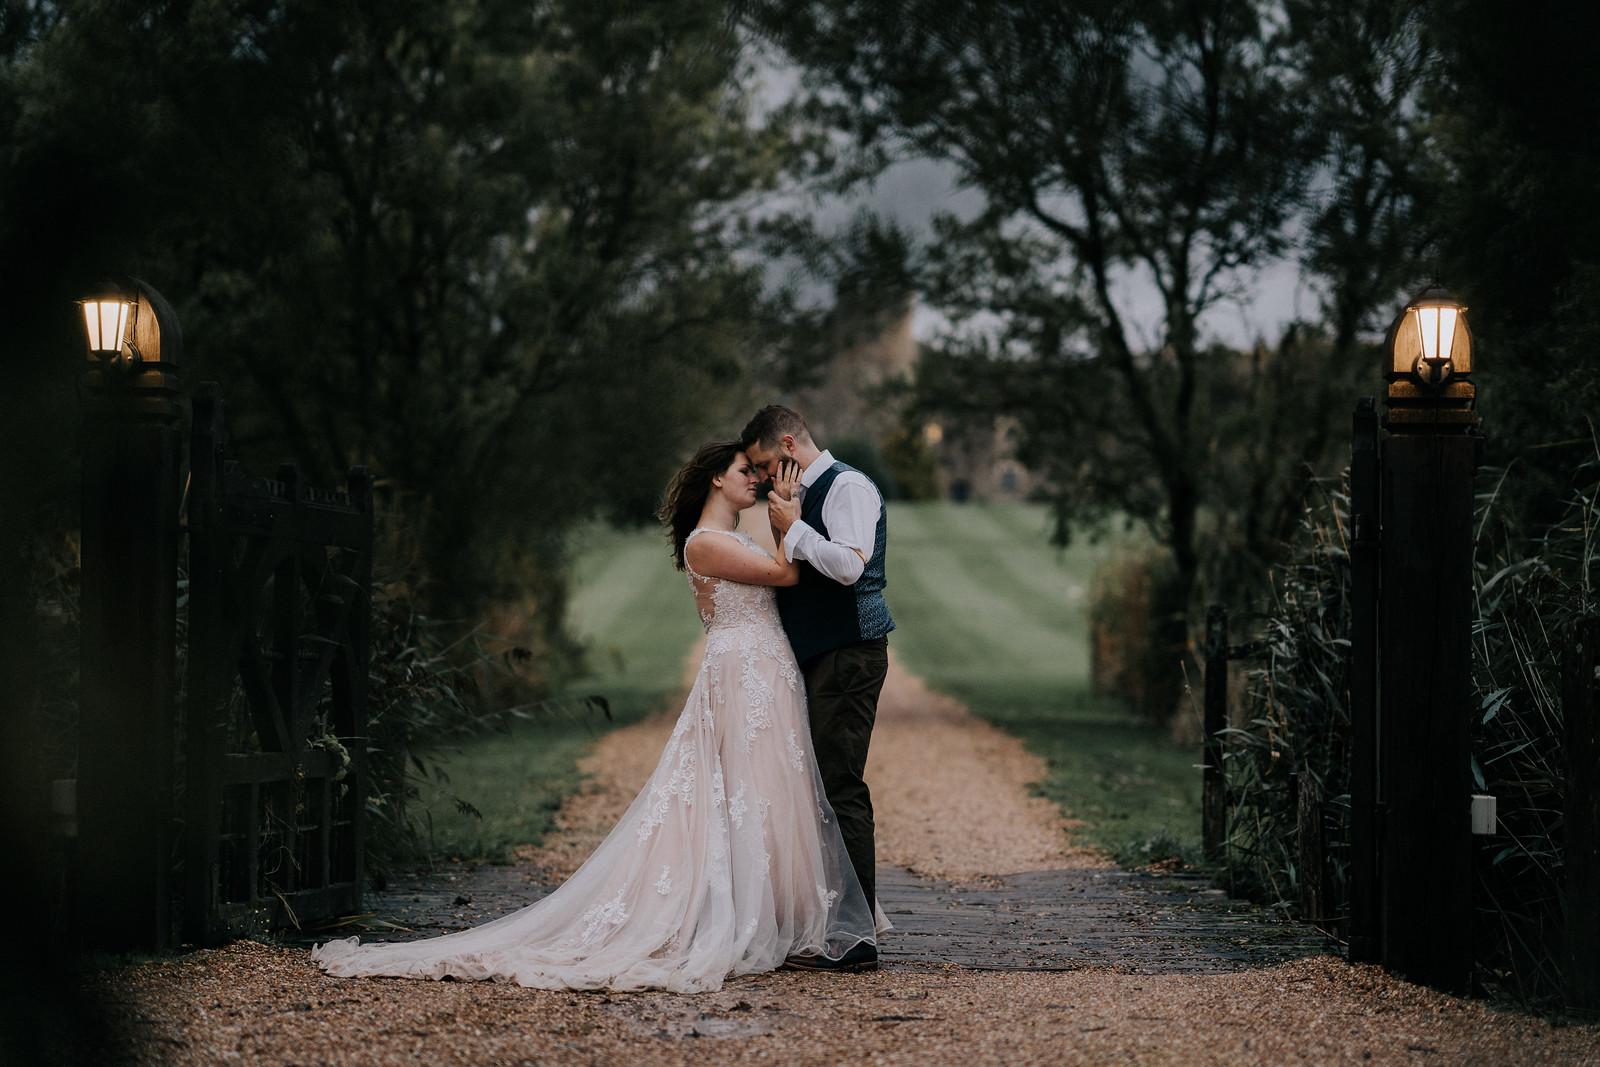 Bride and groom wedding photo with beautiful background - Wedding Photographers Cardiff